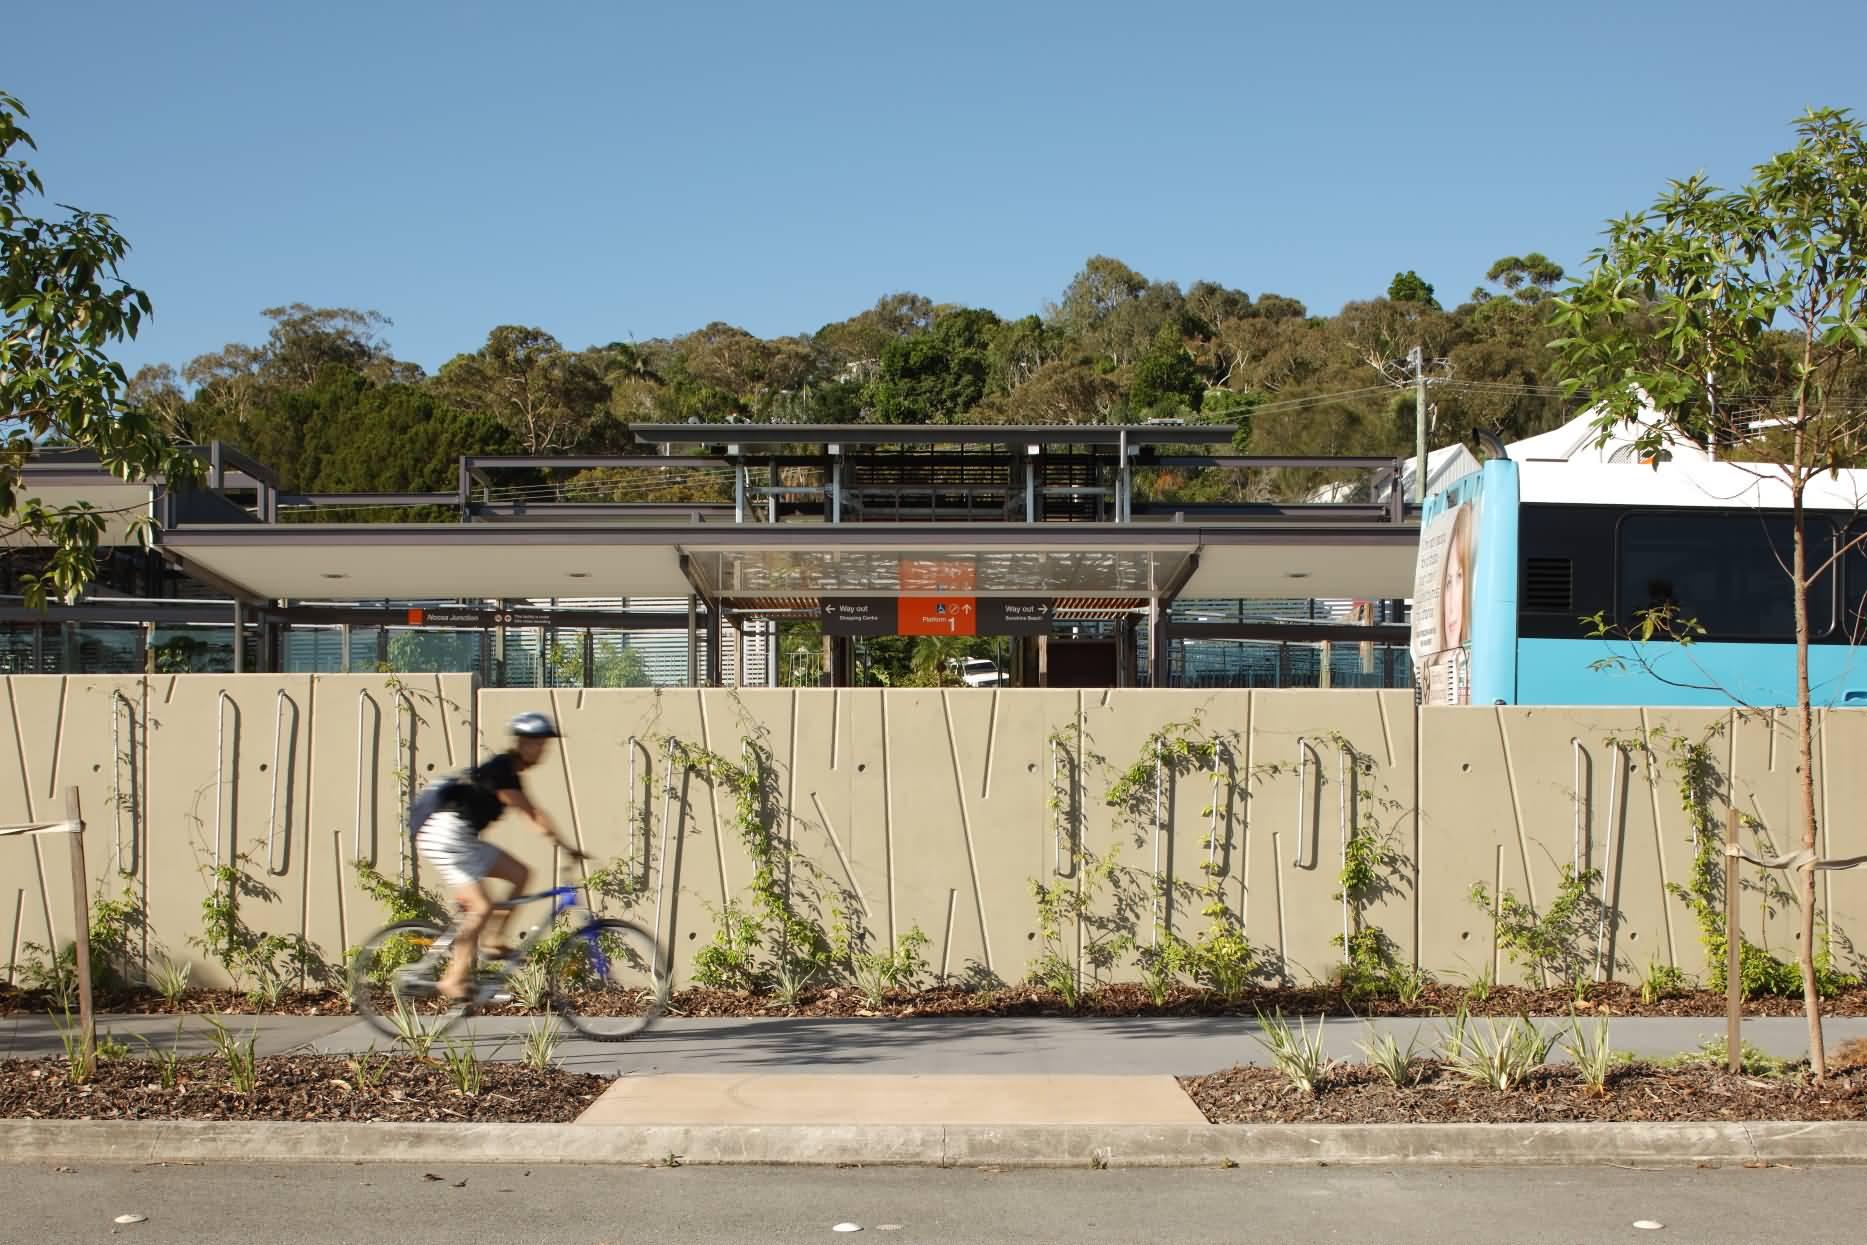 Noosa_Junction Station_Guymer_Bailey_Landscape 9.JPG